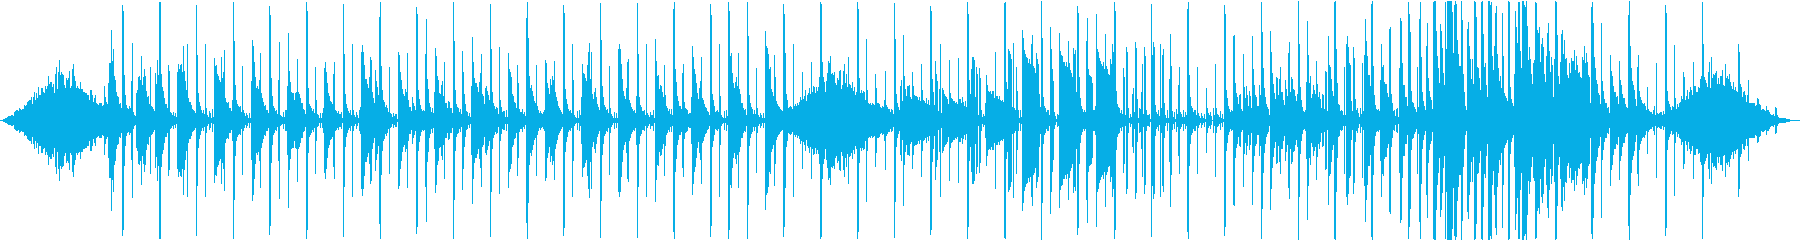 Pianoforte Atmosp...の再生済みの波形